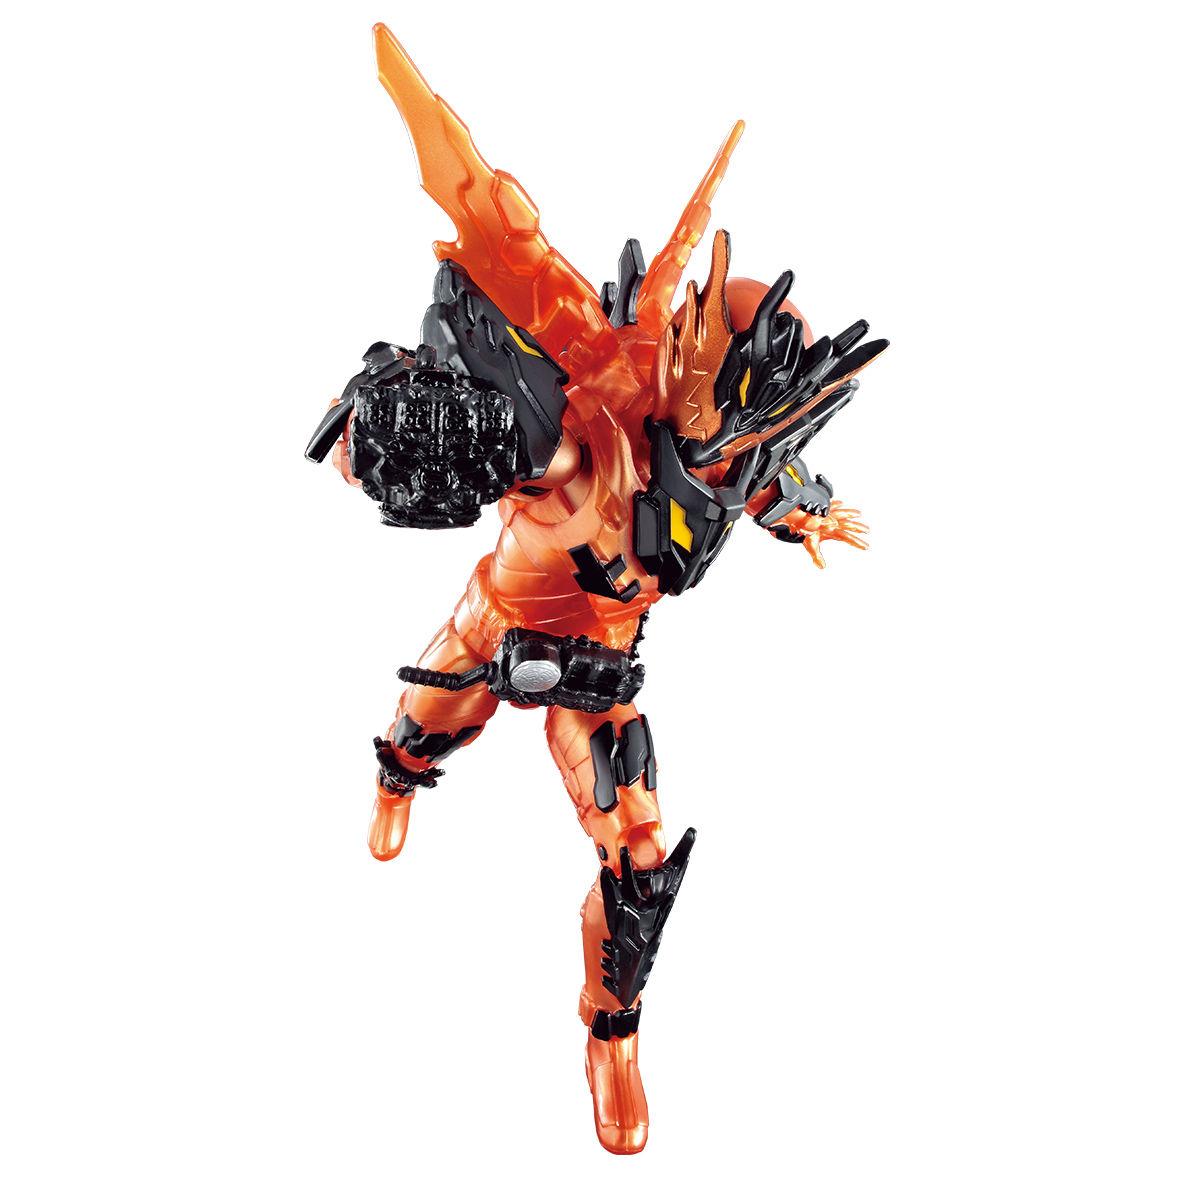 RKFレジェンドライダーシリーズ『仮面ライダークローズマグマ』可動フィギュア-003